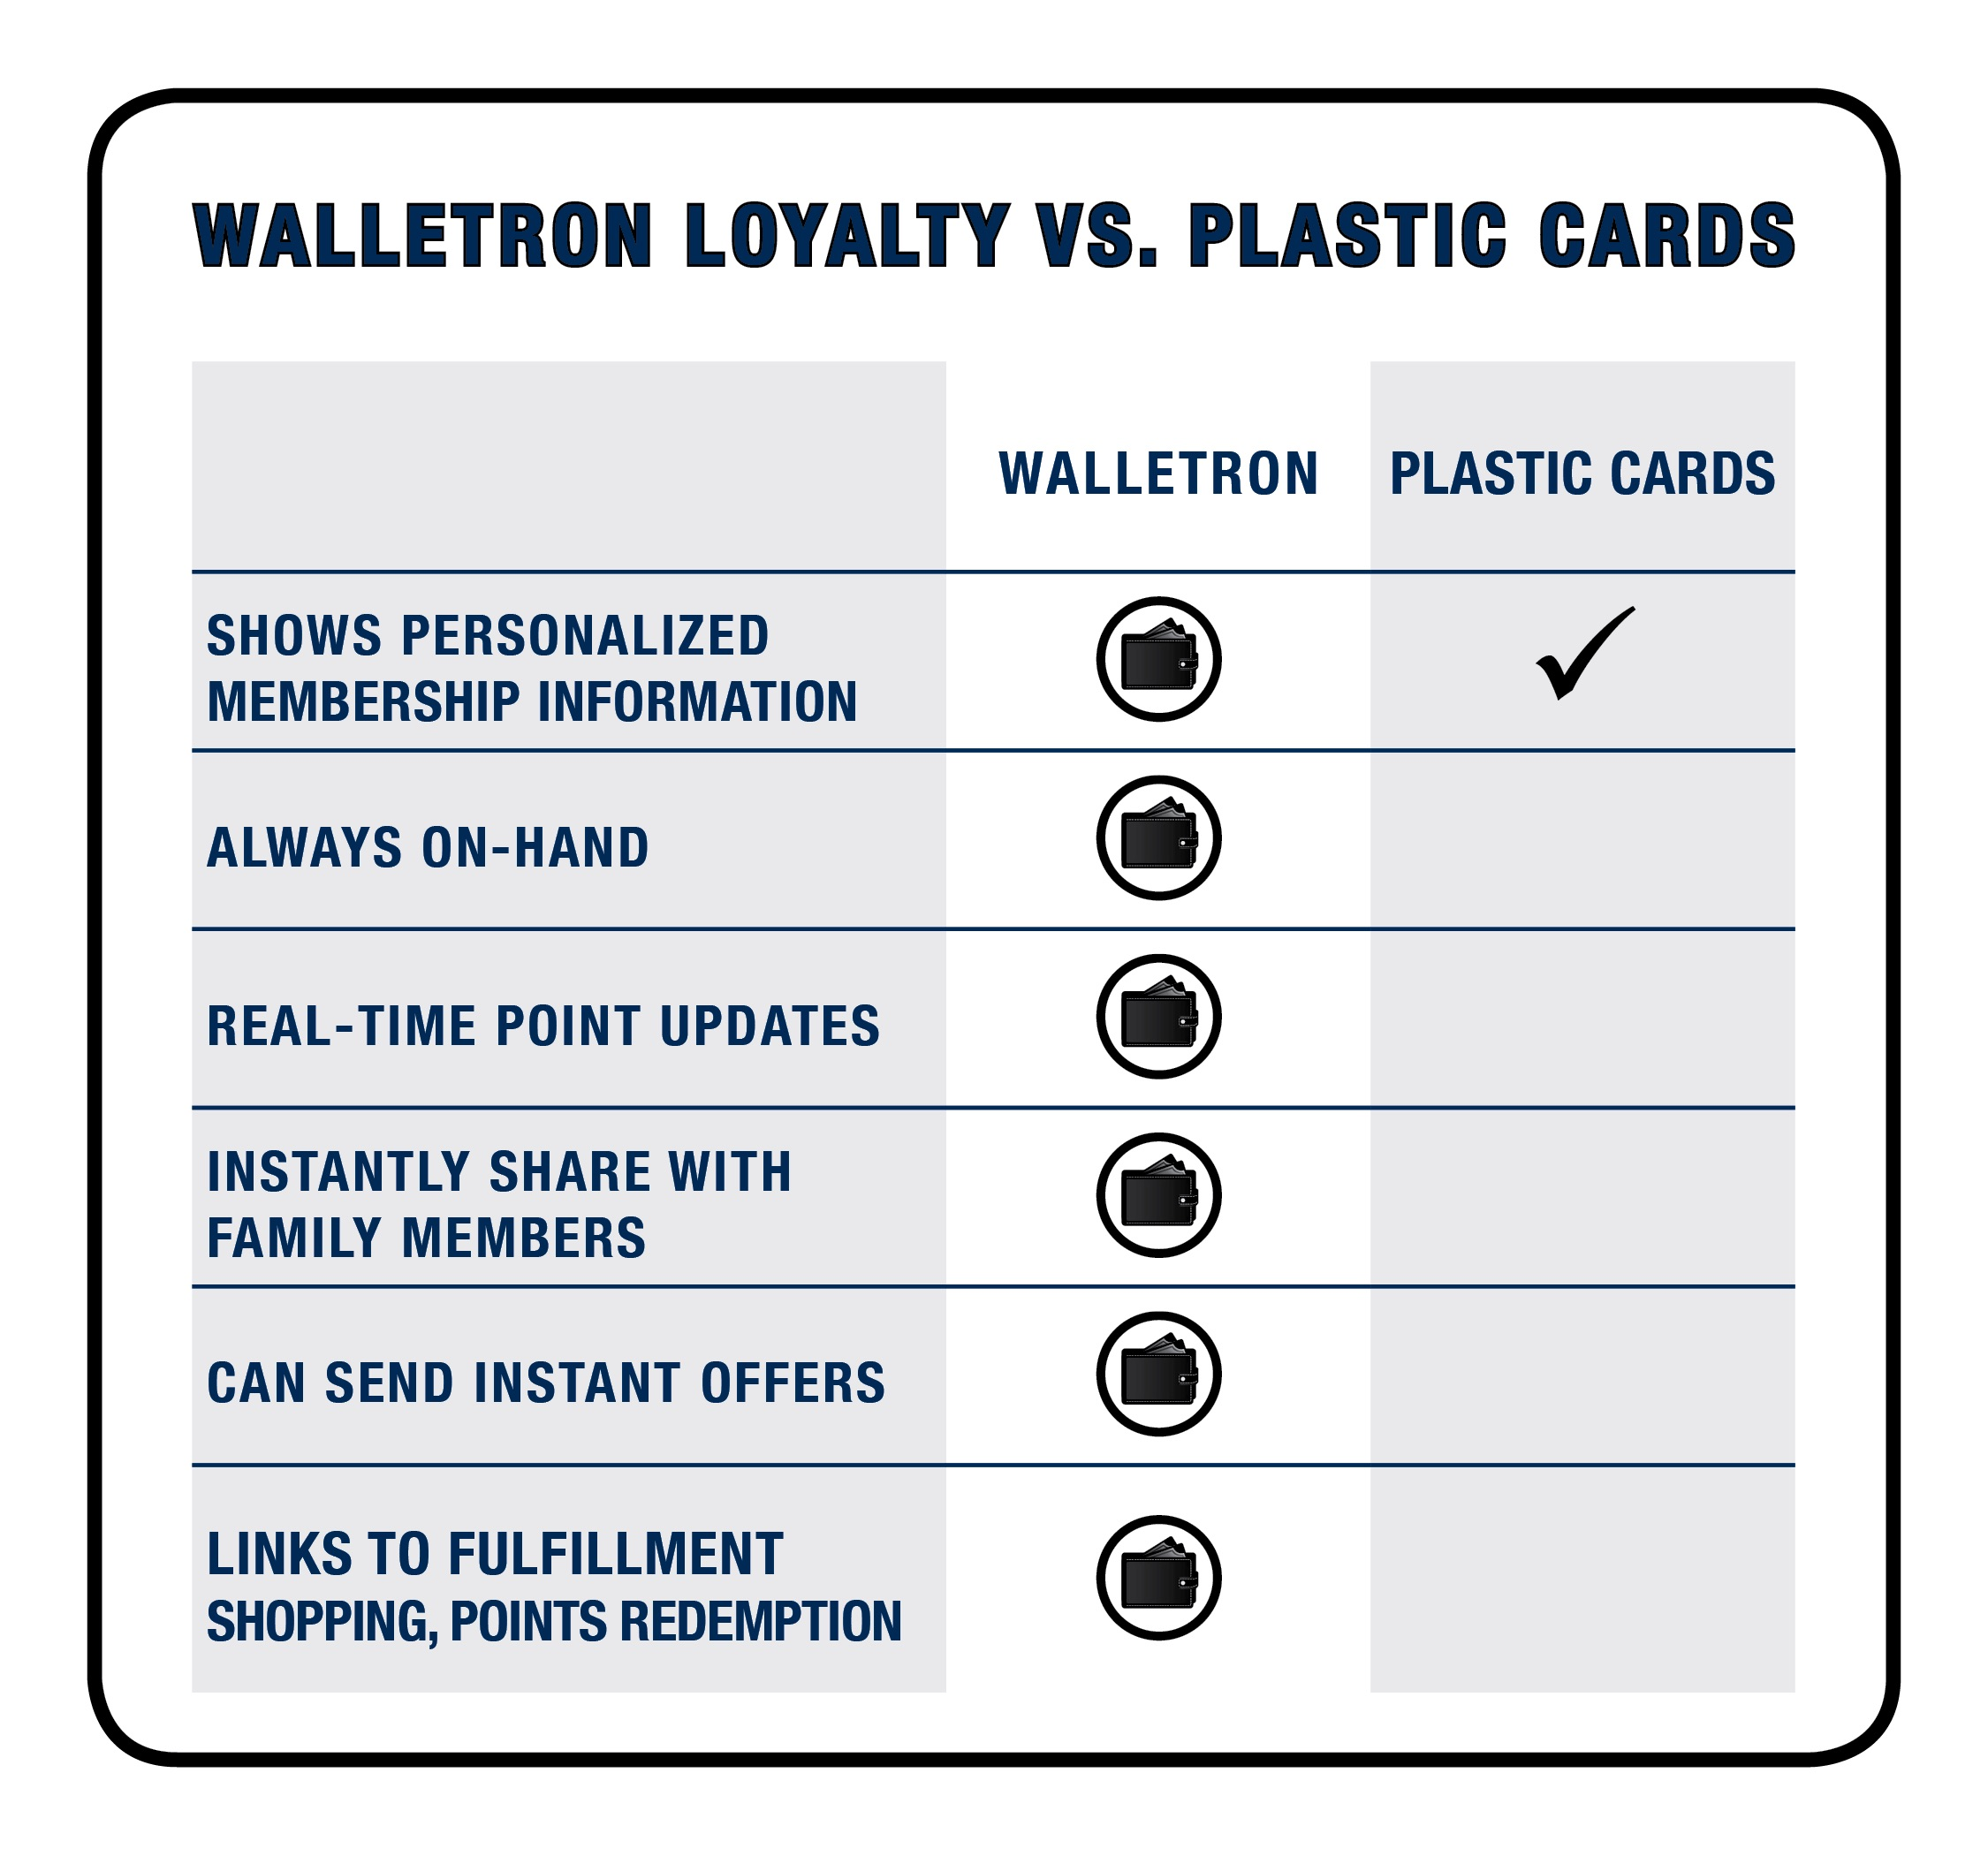 WalletronLoyalty-vs-Plastic Cards[4].jpg